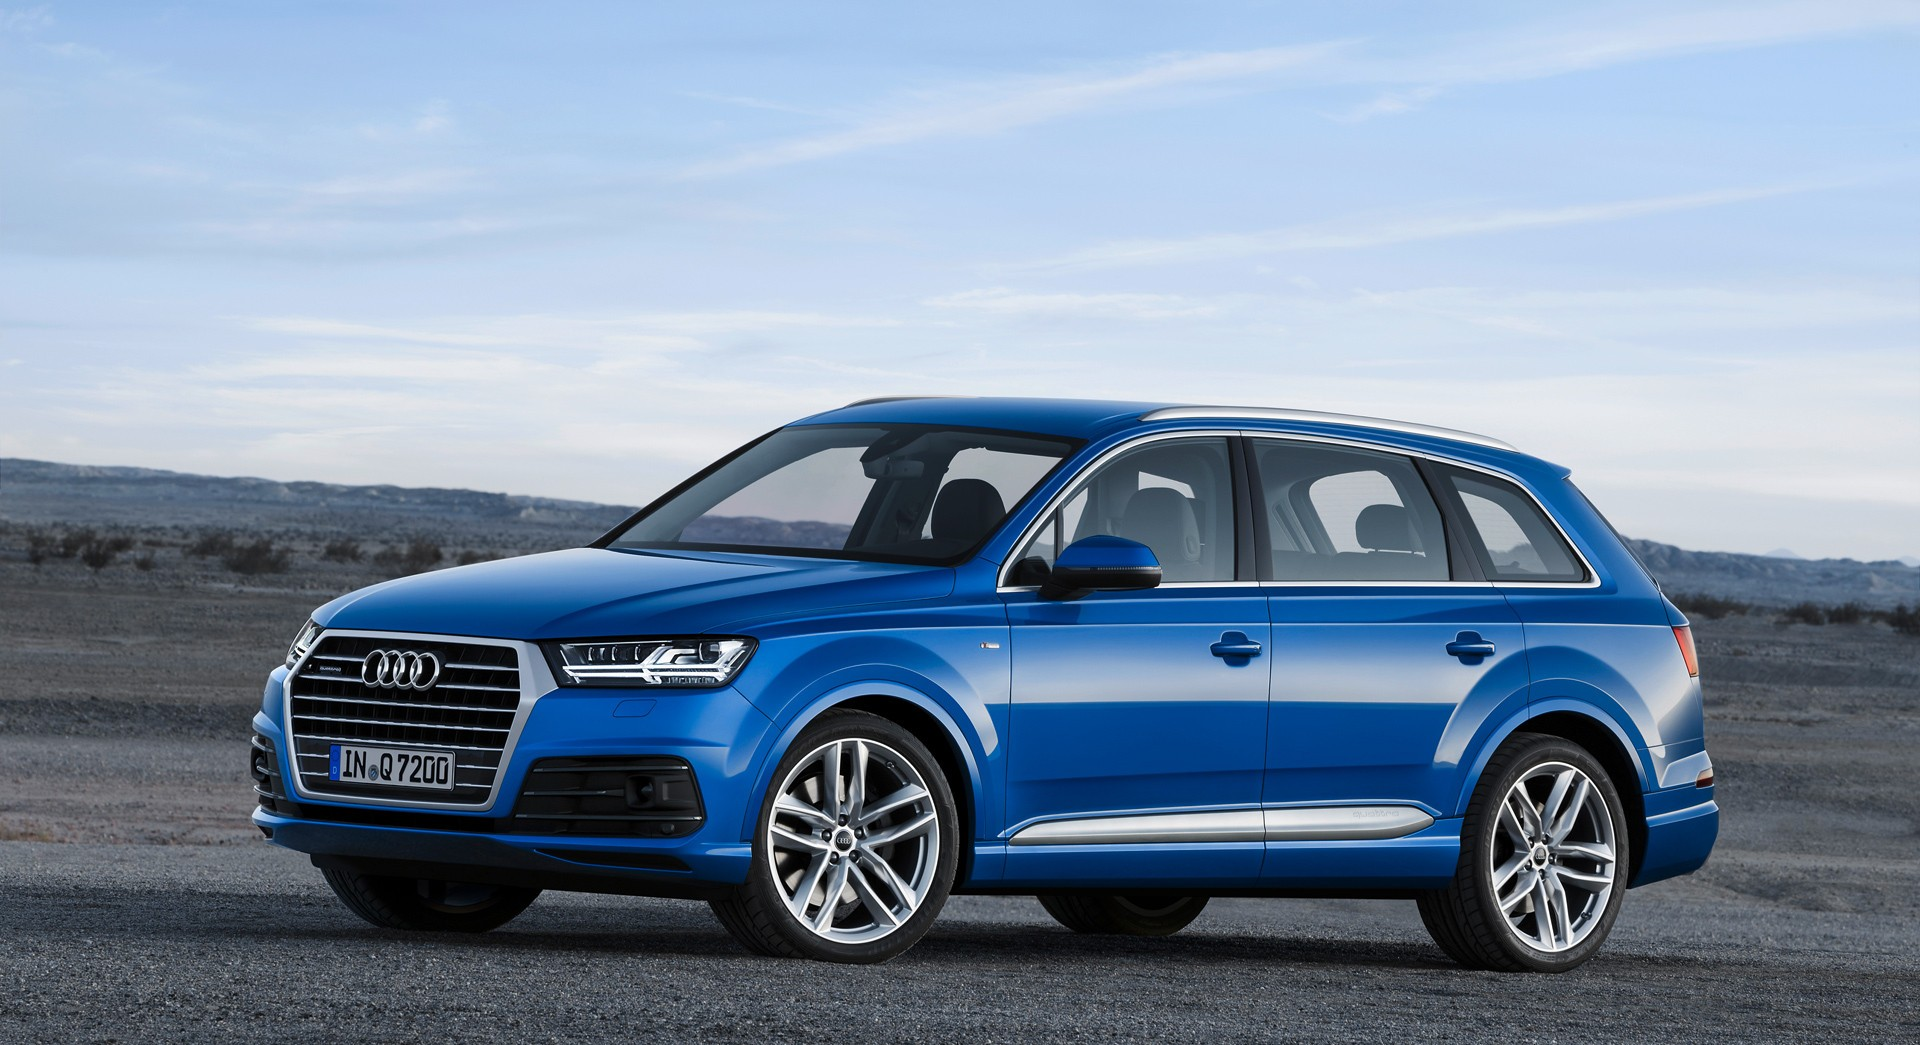 Audi Q7 Blue Sides Hd - HD Desktop Wallpapers